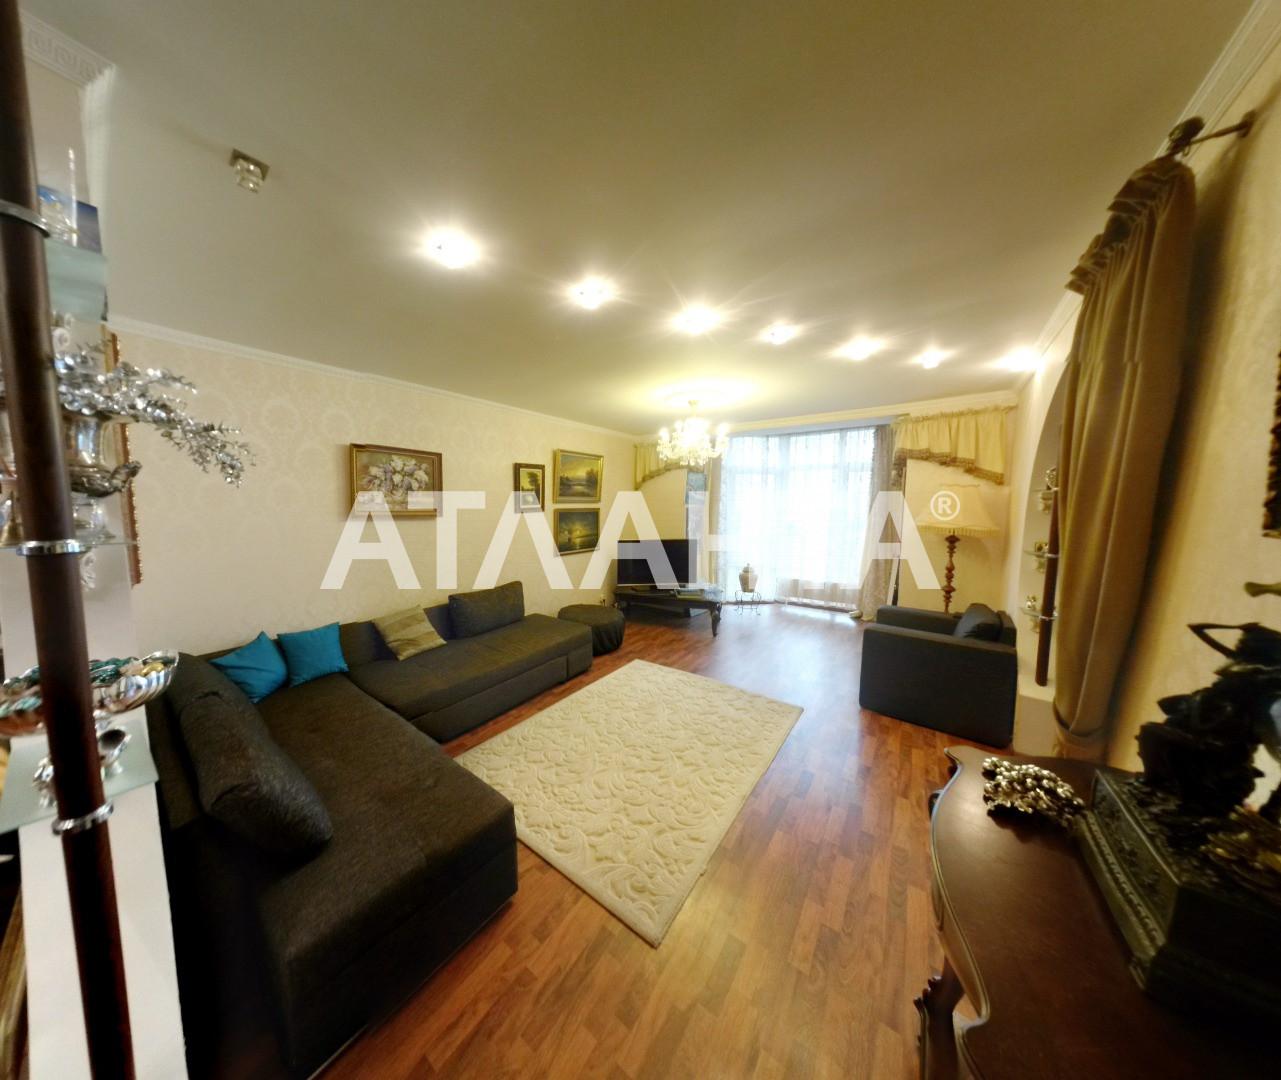 Продается 3-комнатная Квартира на ул. Ул. Ломоносова — 139 600 у.е. (фото №2)